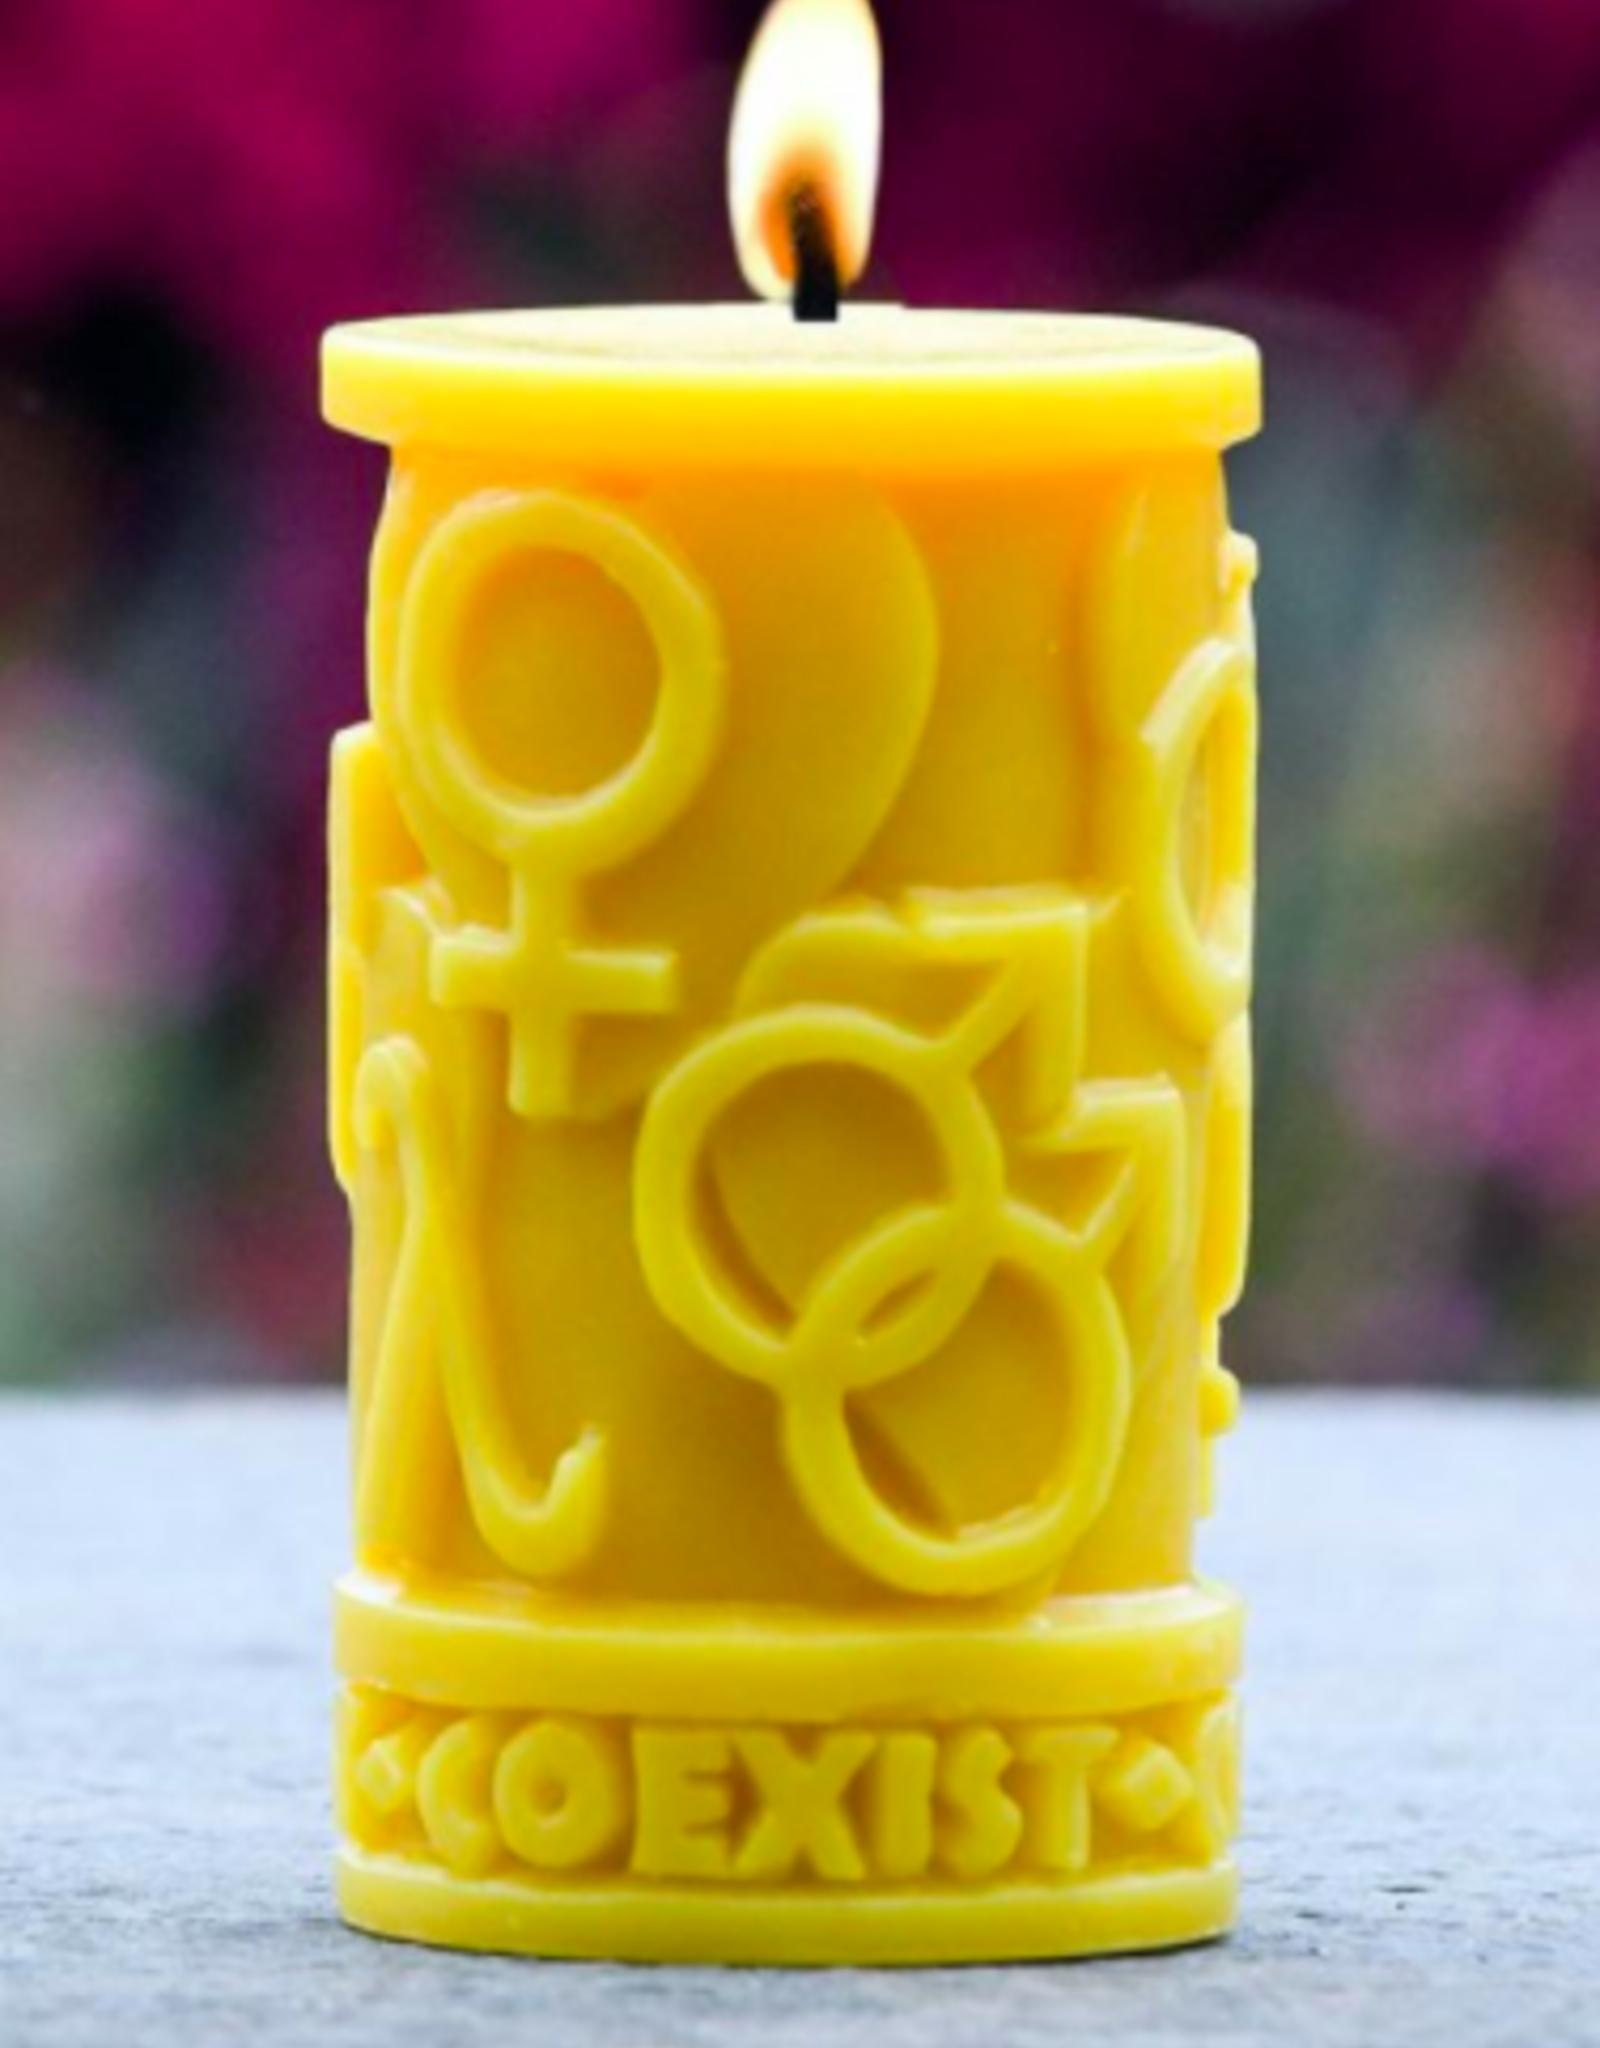 Sunbeam Coexist in Love Candle